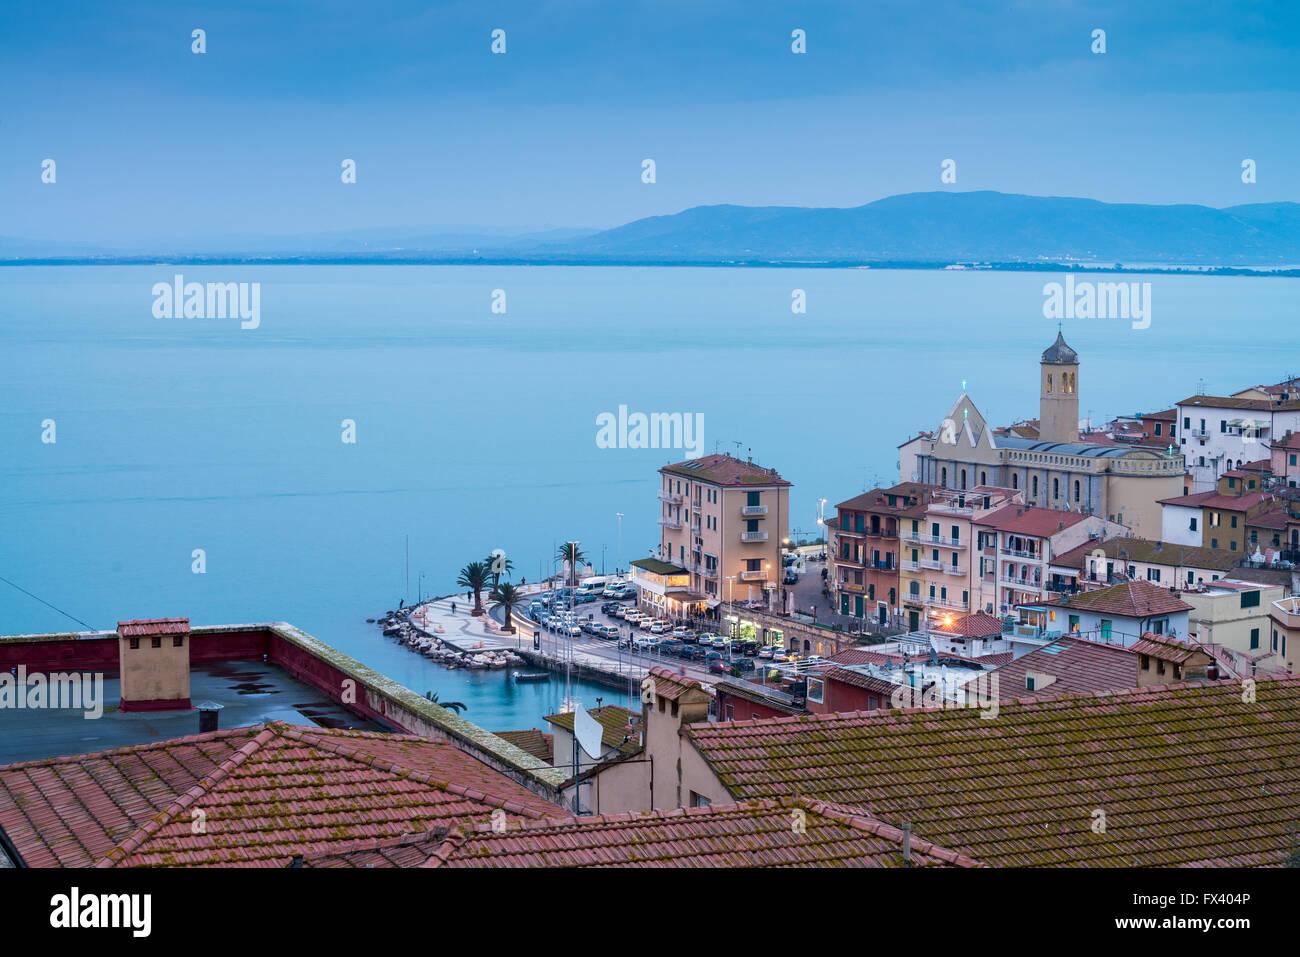 Porto Santo Stefano, Monte argentario, Province of Grosseto, Tuscany, Italy Stock Photo